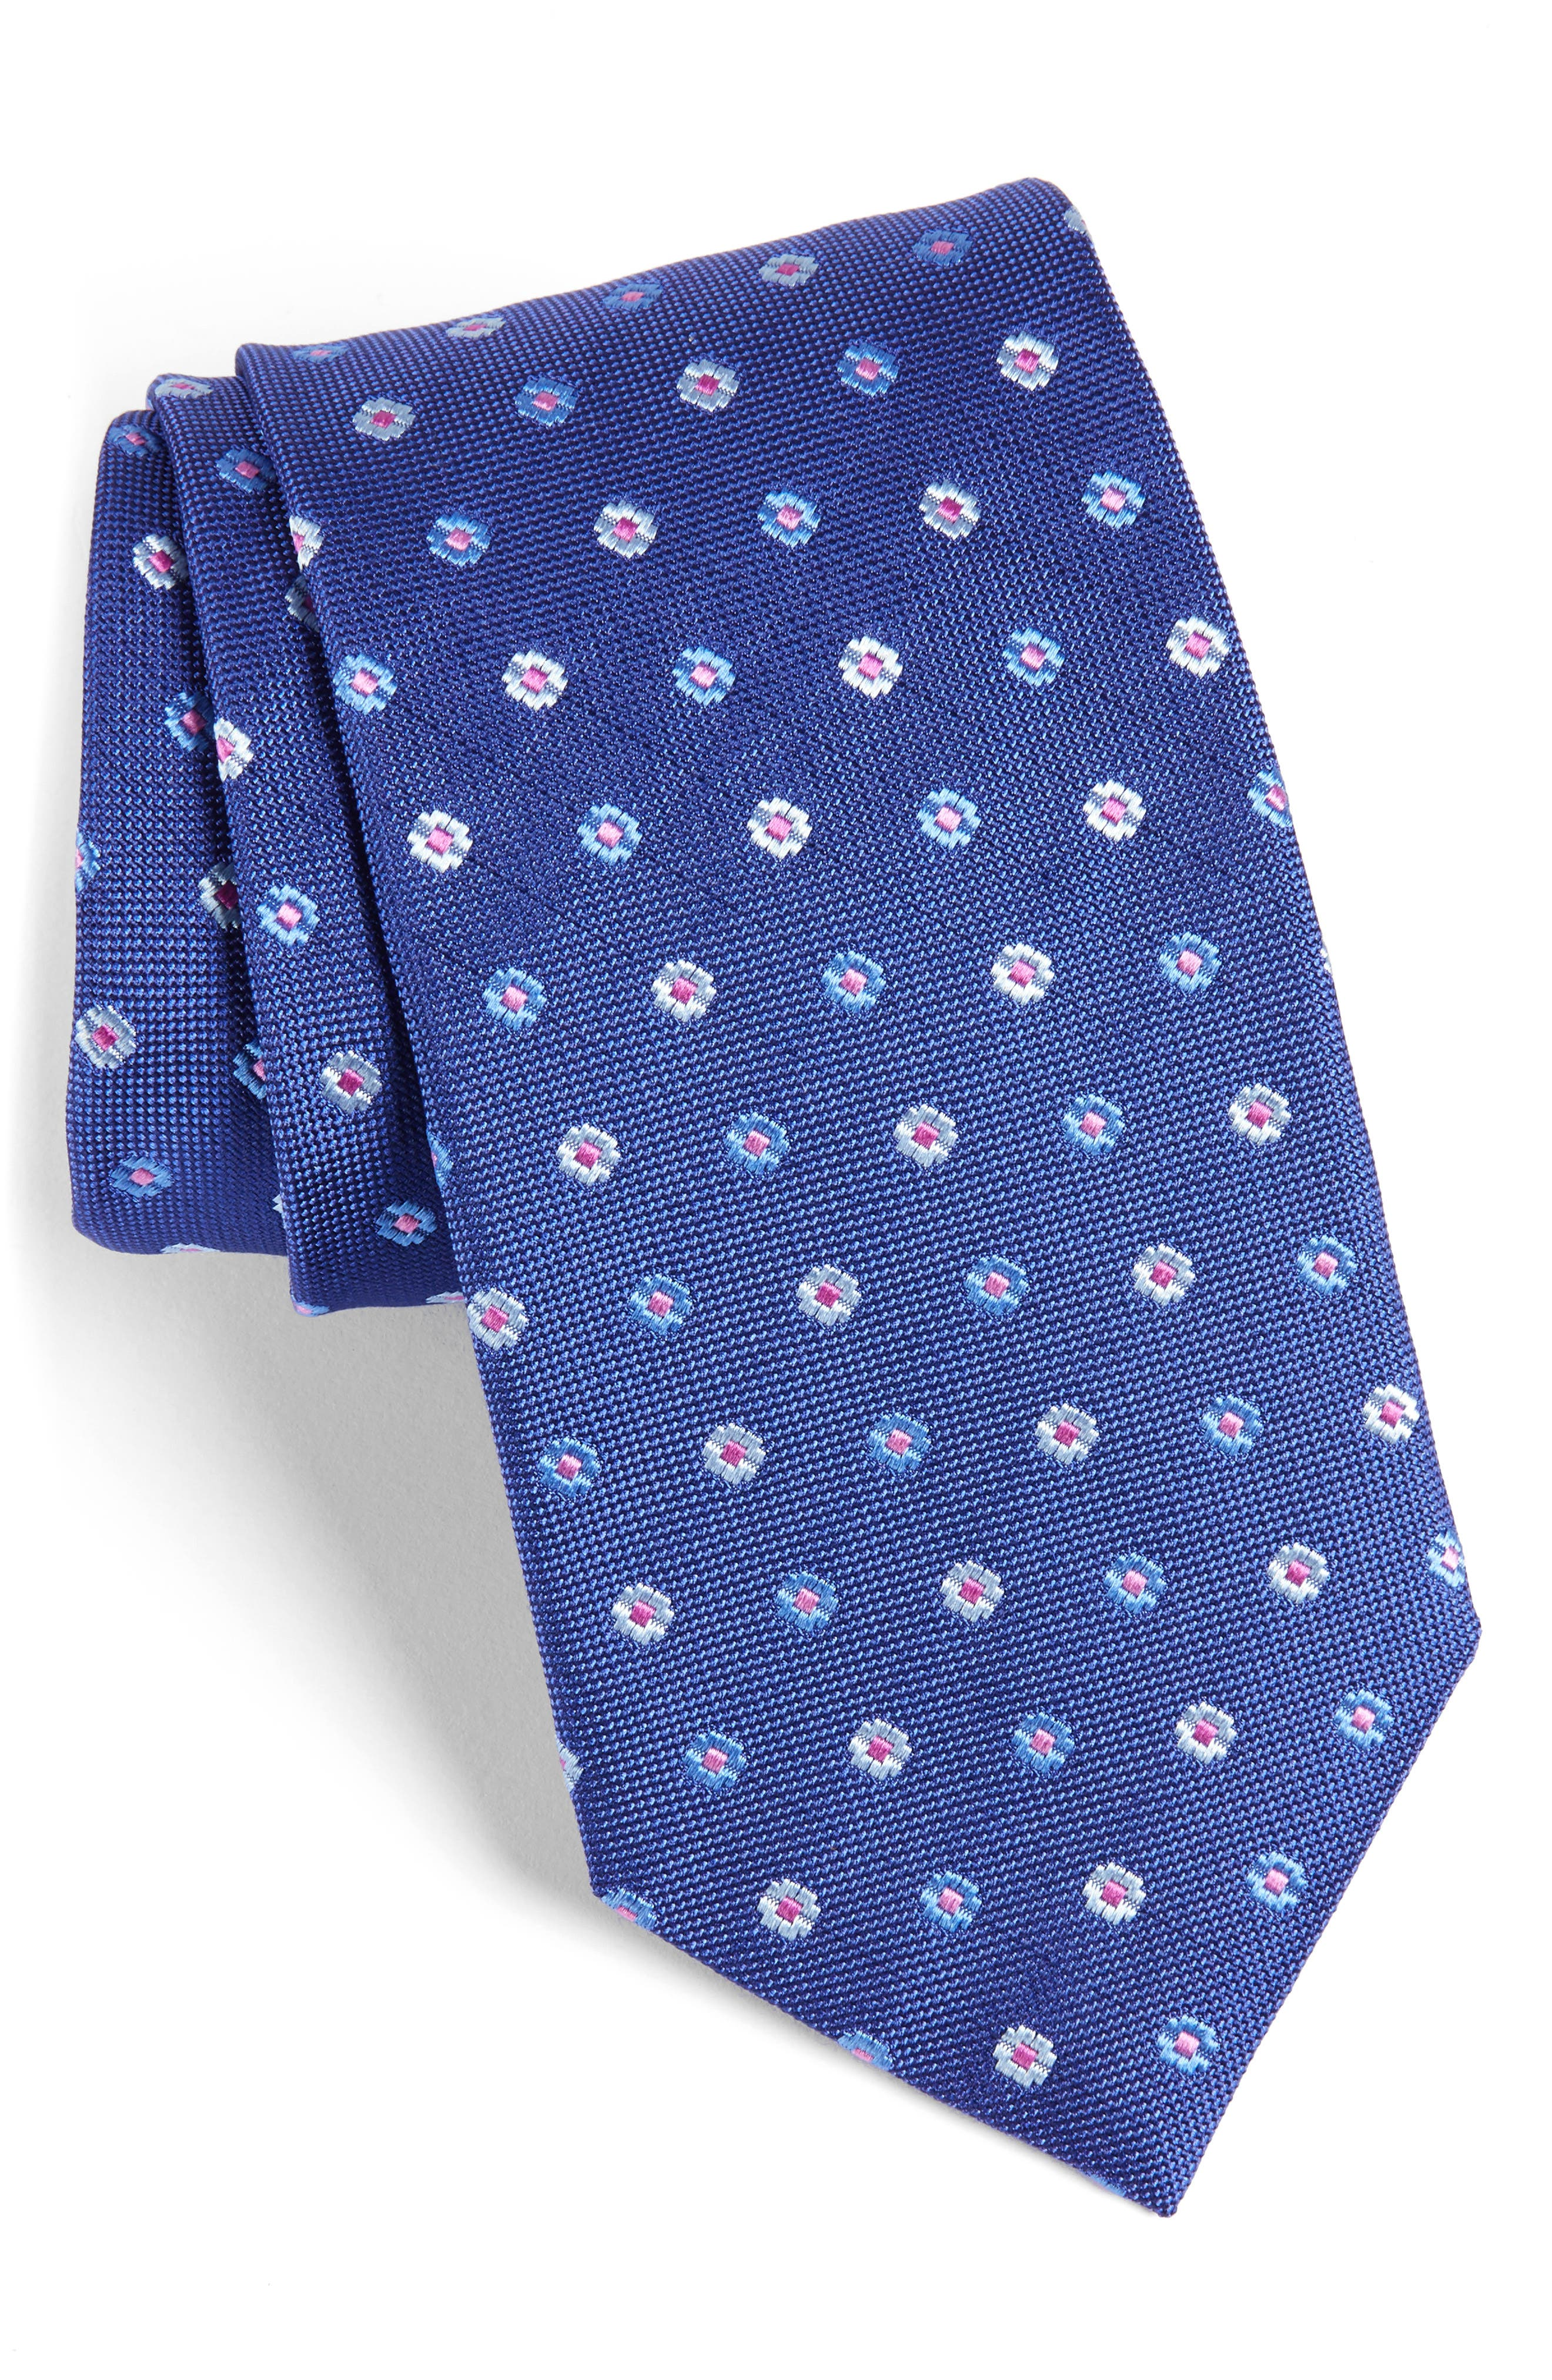 Alternate Image 1 Selected - David Donahue Neat Floral Medallion Silk Tie